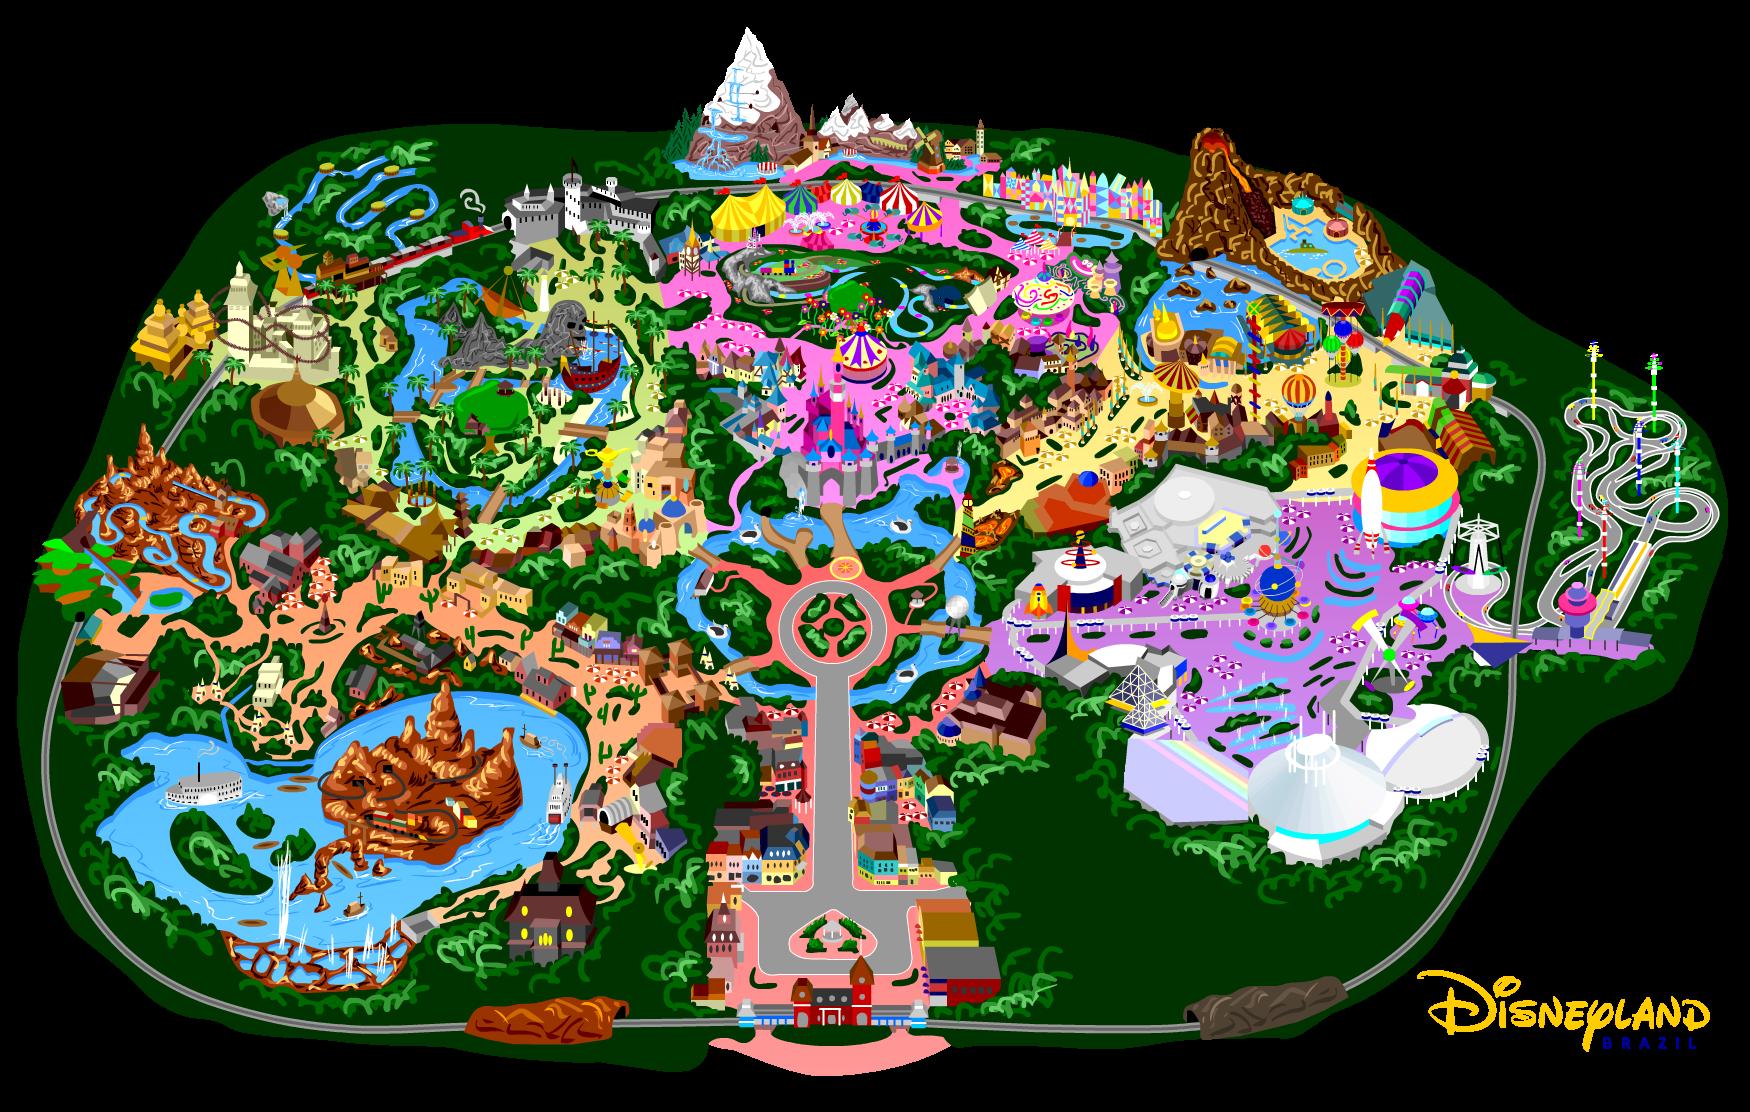 2015 Printable Disneyland Park Map | Search Results | Calendar 2015